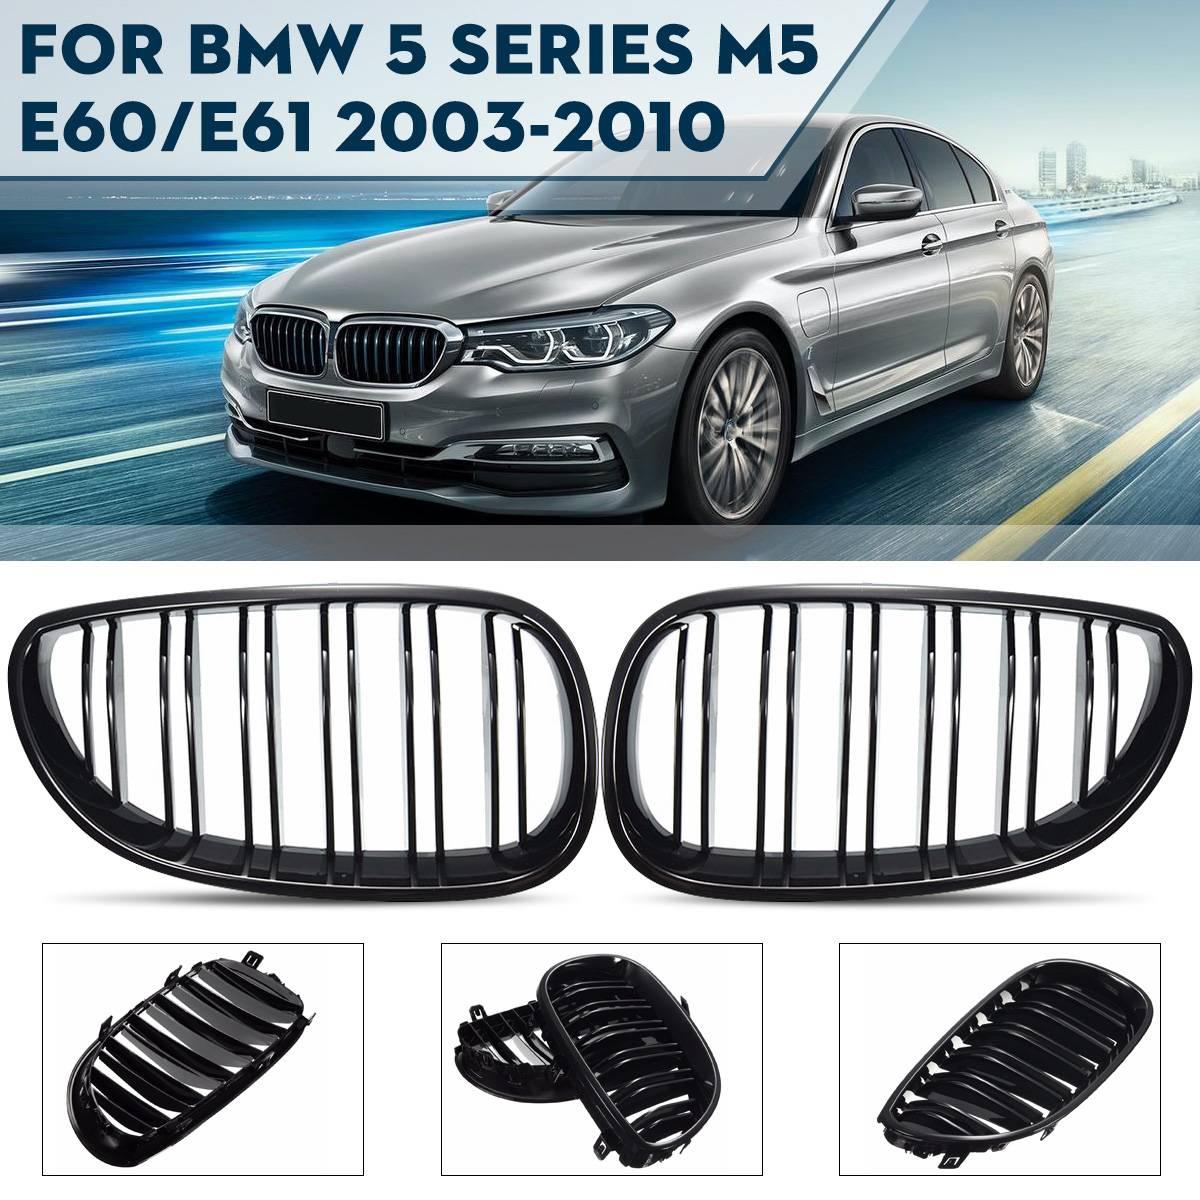 Par de rejillas de rejilla deportiva para coche, rejilla de riñón, rejilla negra brillante para BMW serie 5 M5 E60 E61 2003 2004 2005 2006 2007 2008 2009 2010